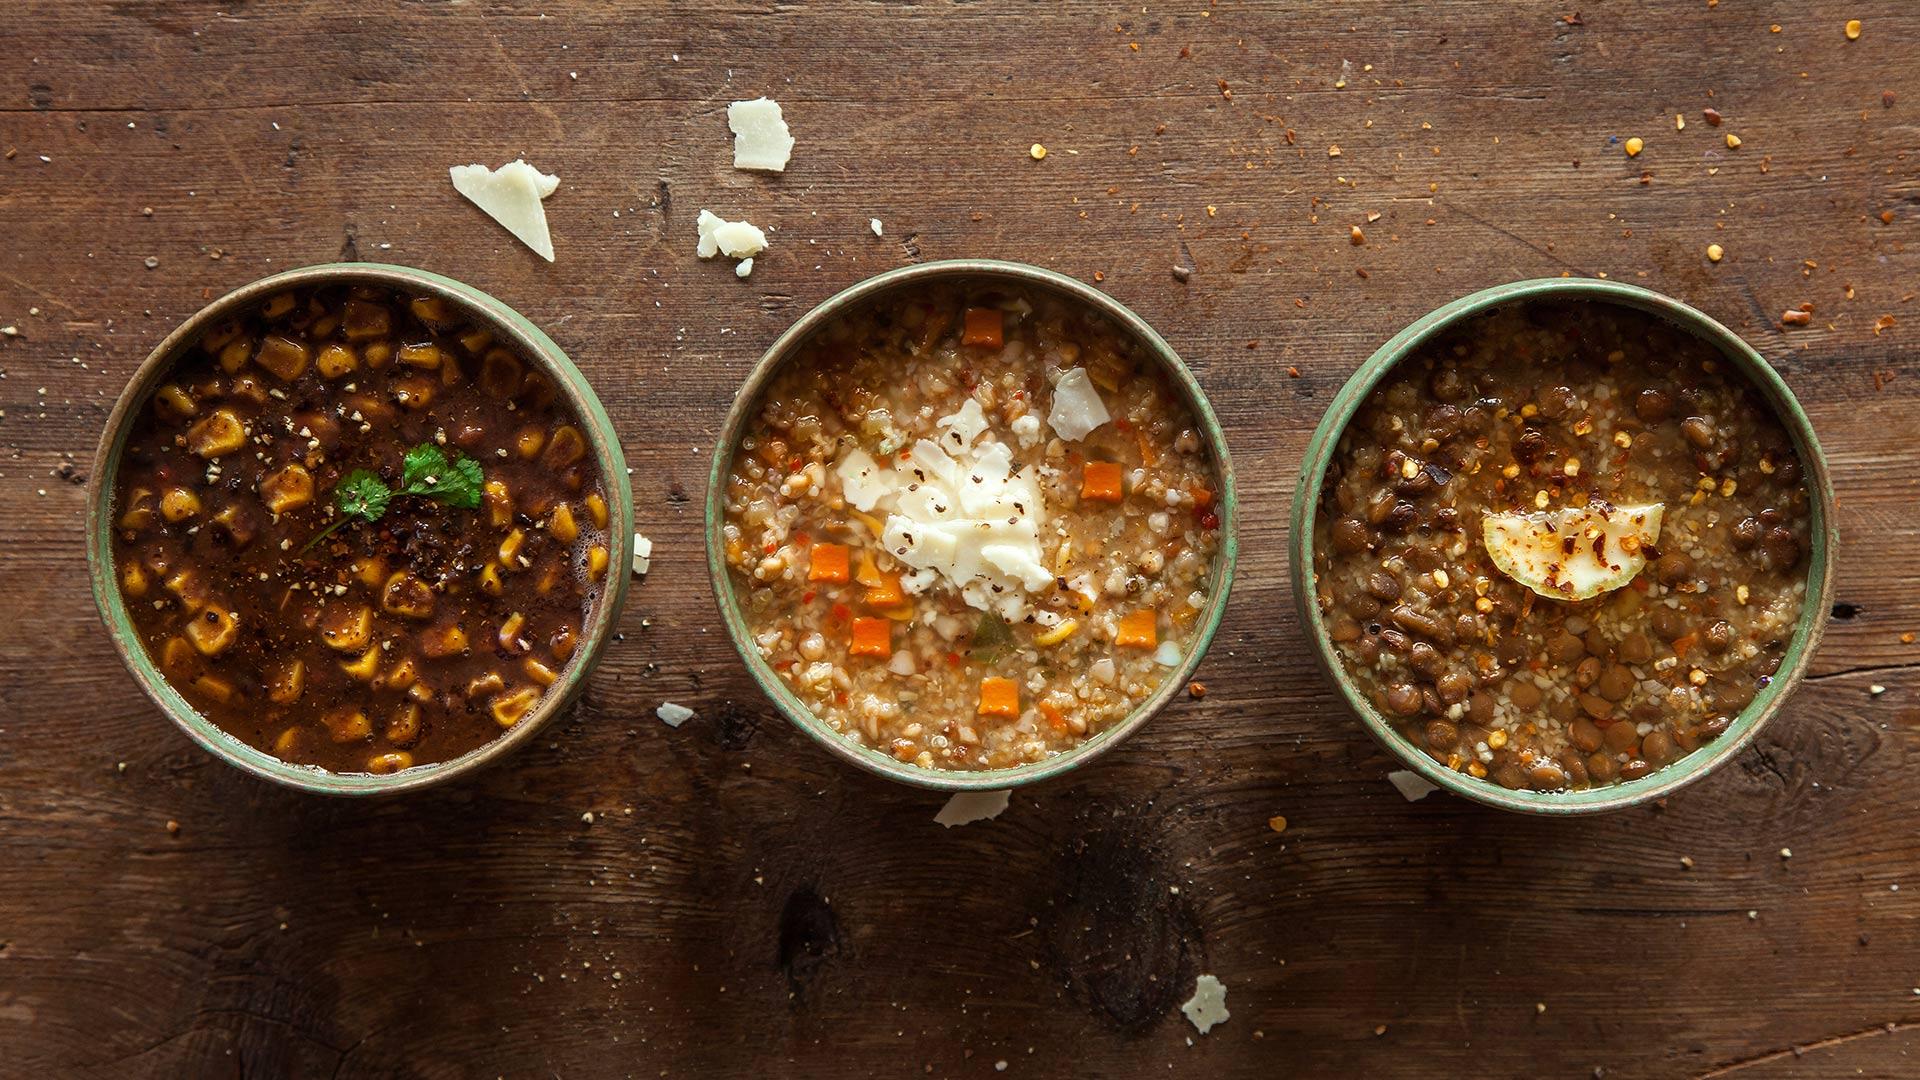 Why Food? By Yvon Chouinard